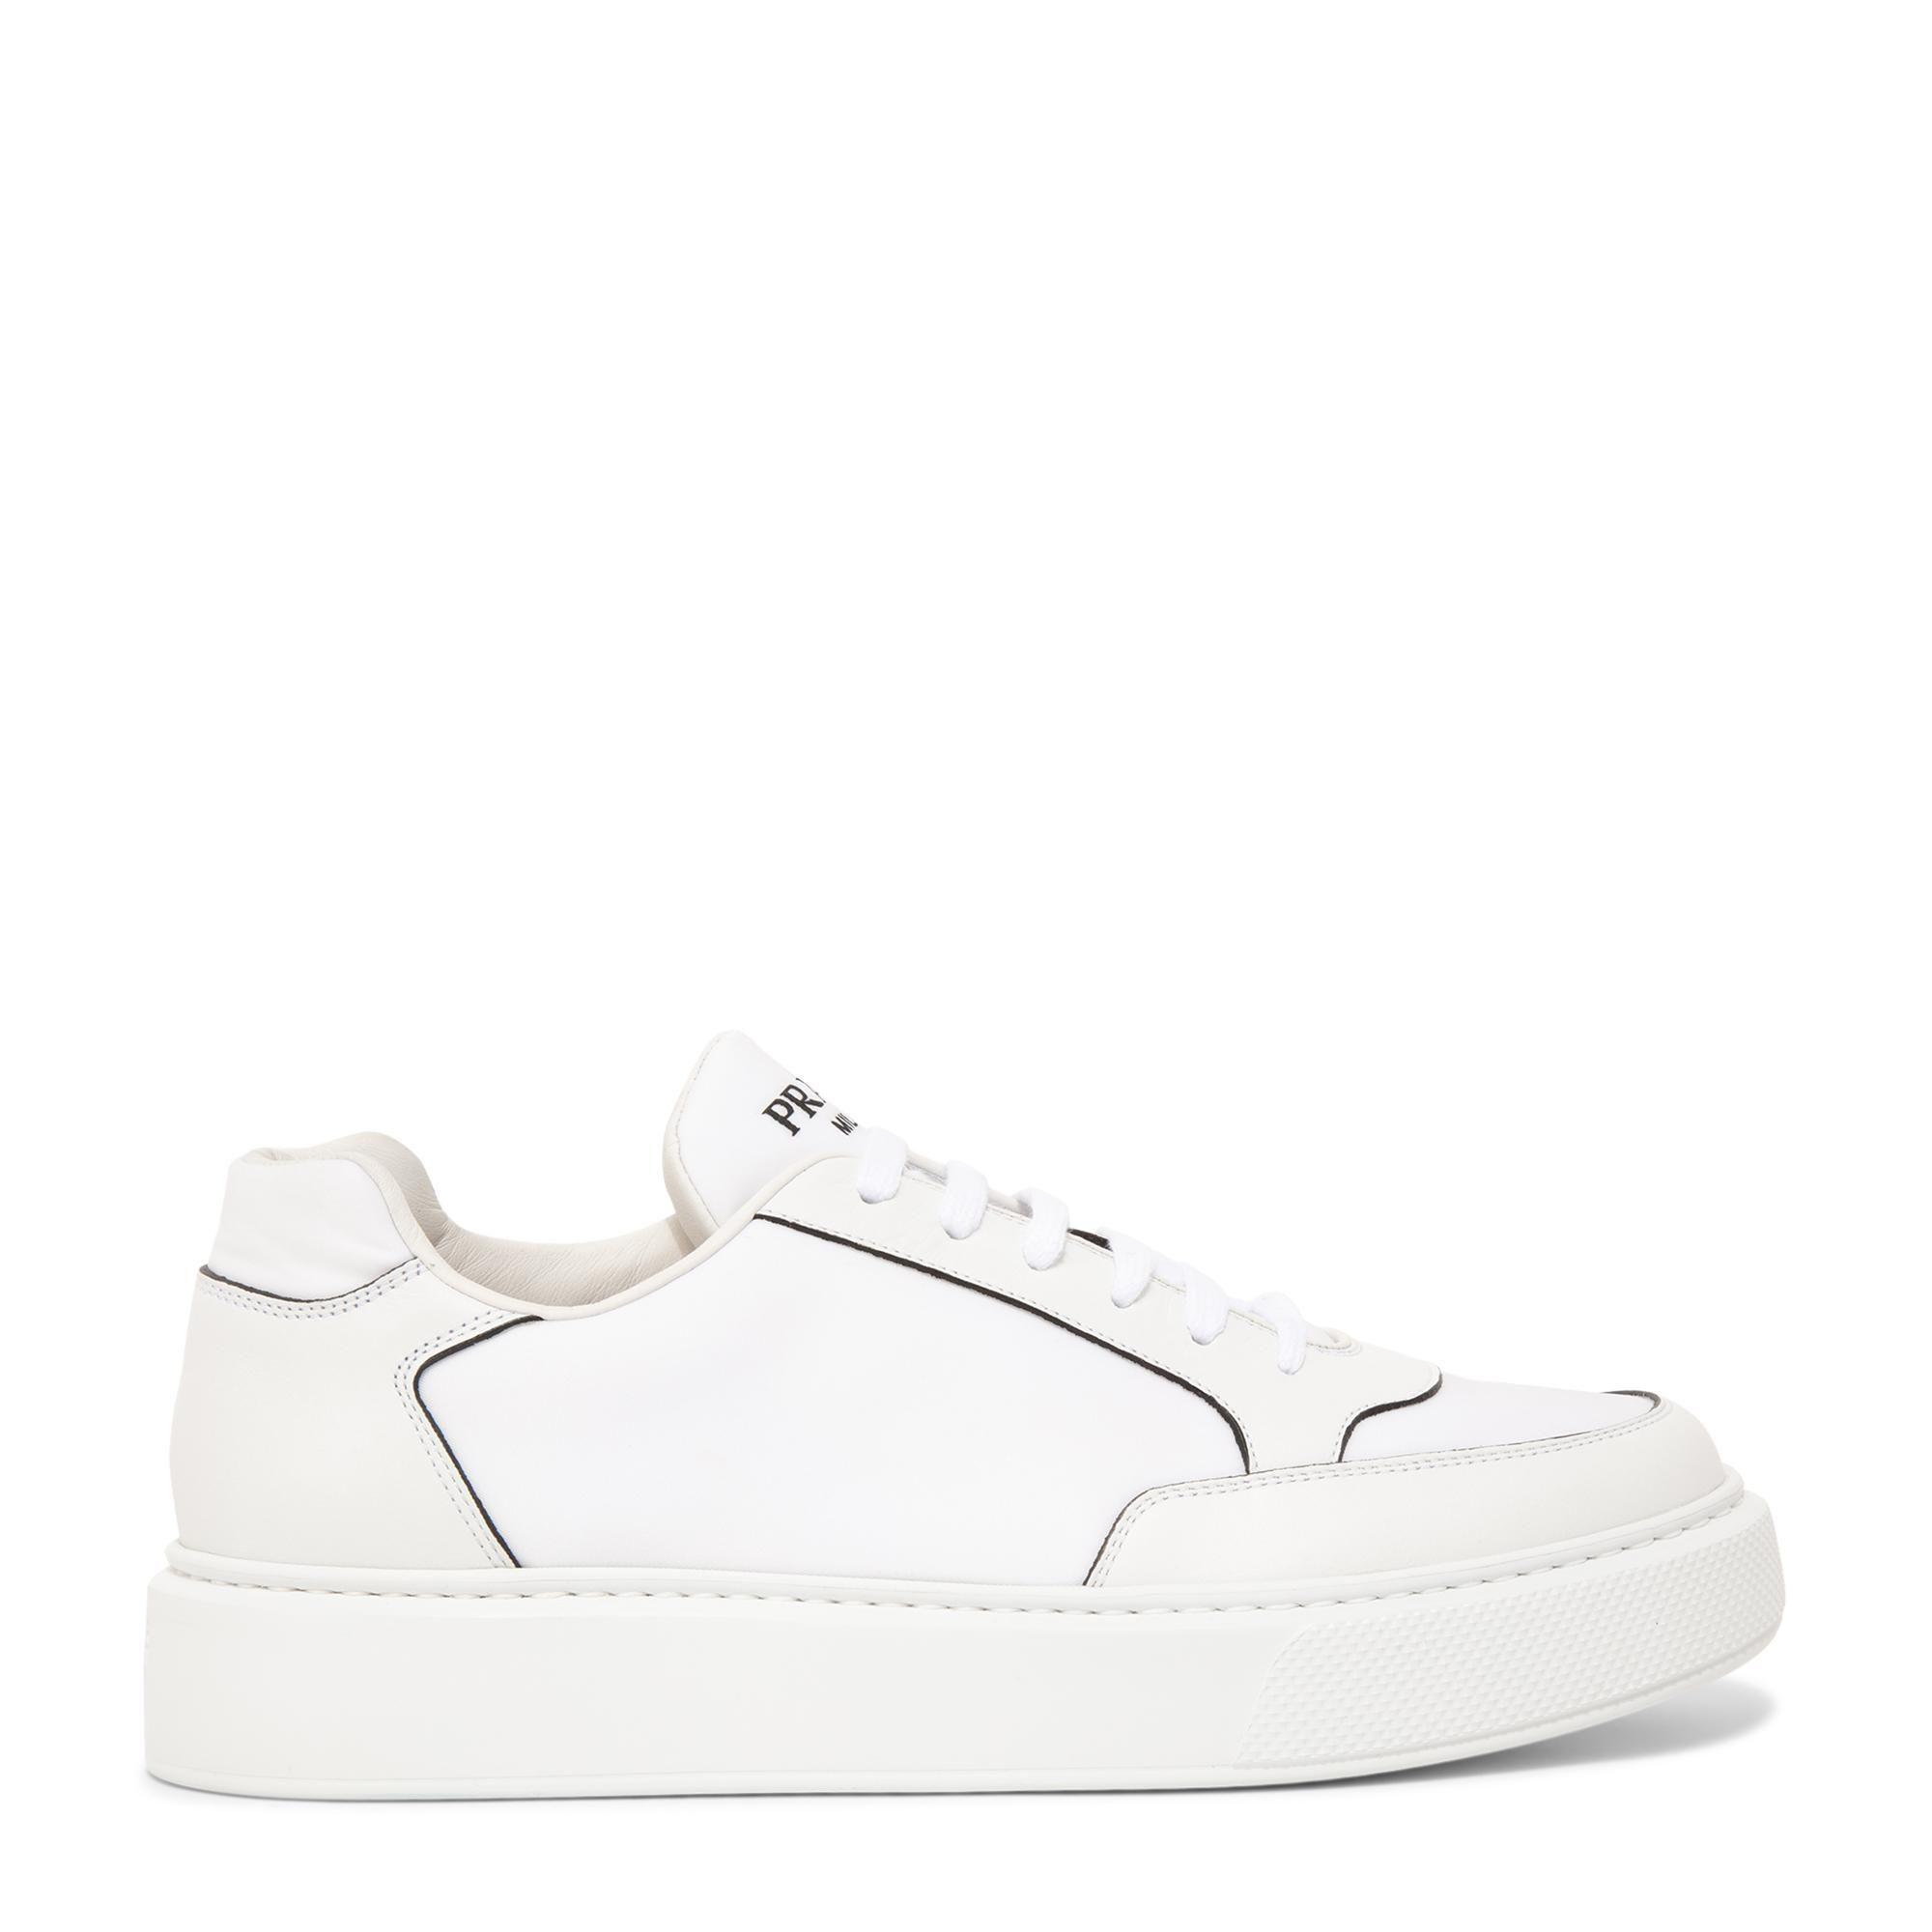 Macro leather and nylon sneakers